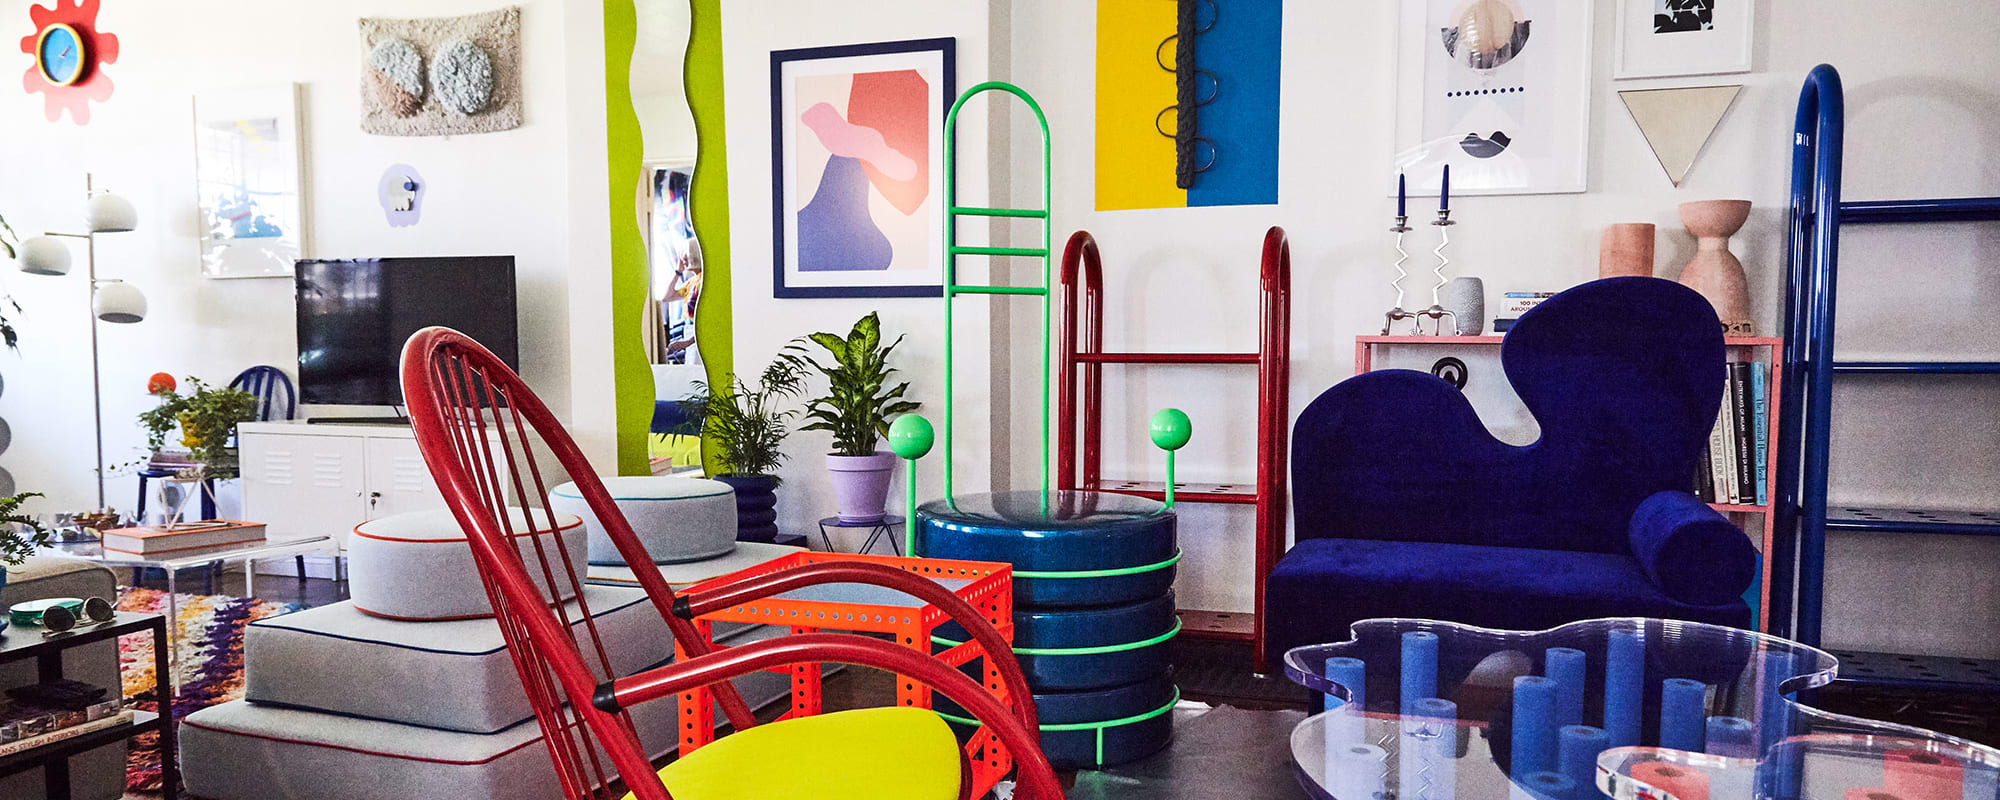 Leah Ring, Wohnung, Los Angeles, Design, Kunst